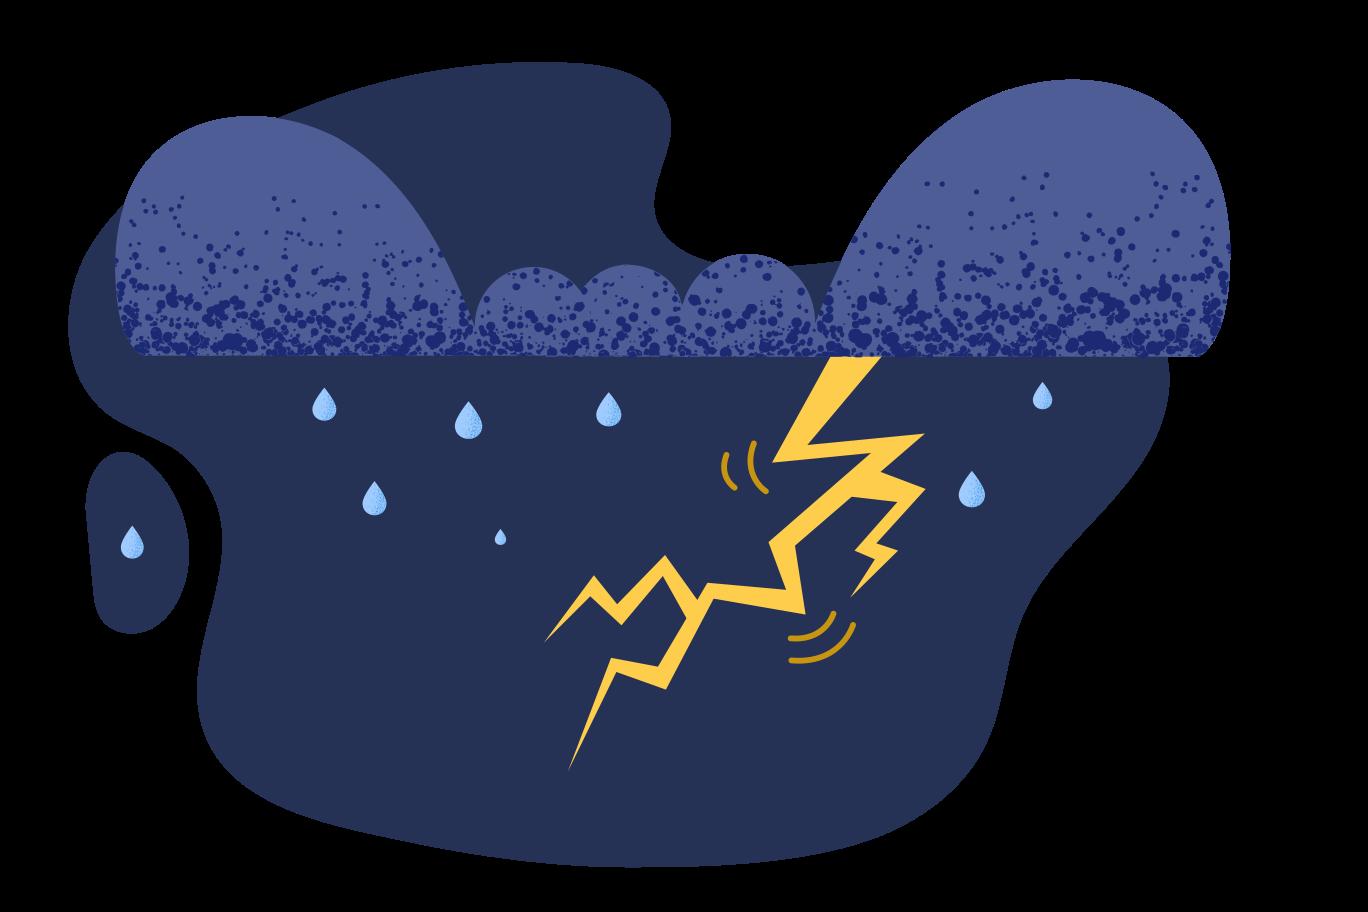 Thunderstorm Clipart illustration in PNG, SVG